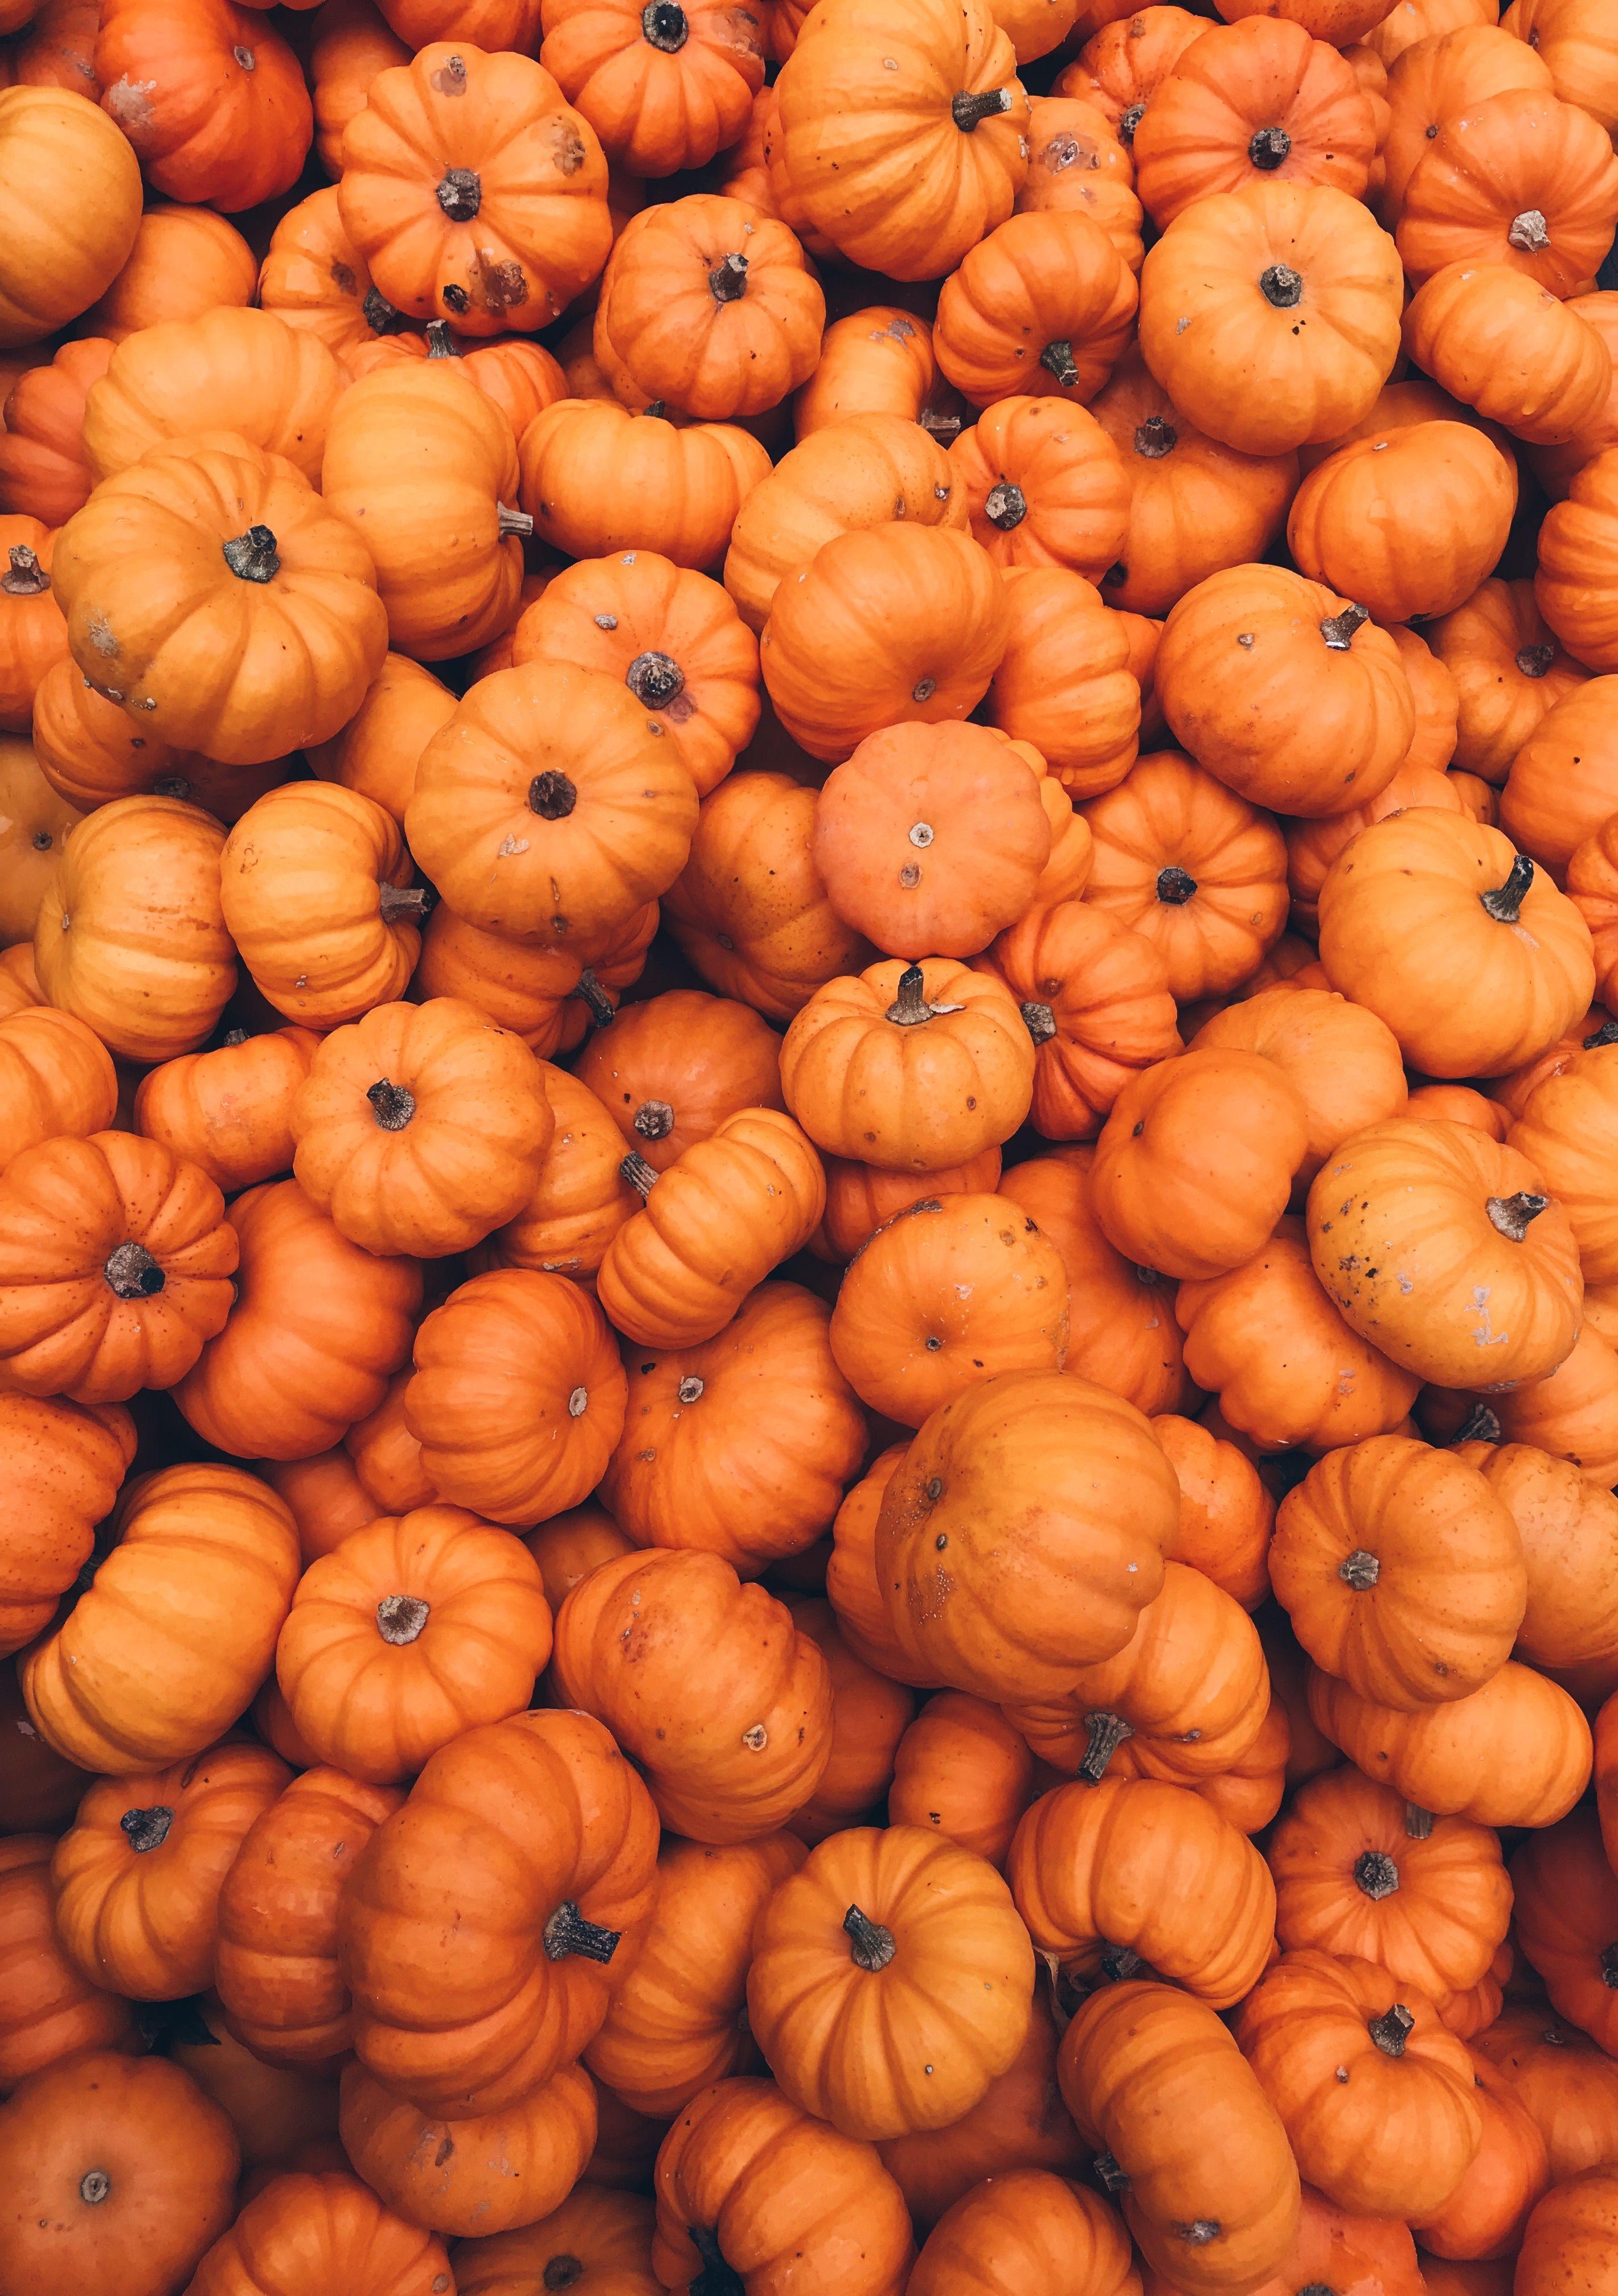 Autumn Aesthetic Wallpapers - Top Free Autumn Aesthetic ...